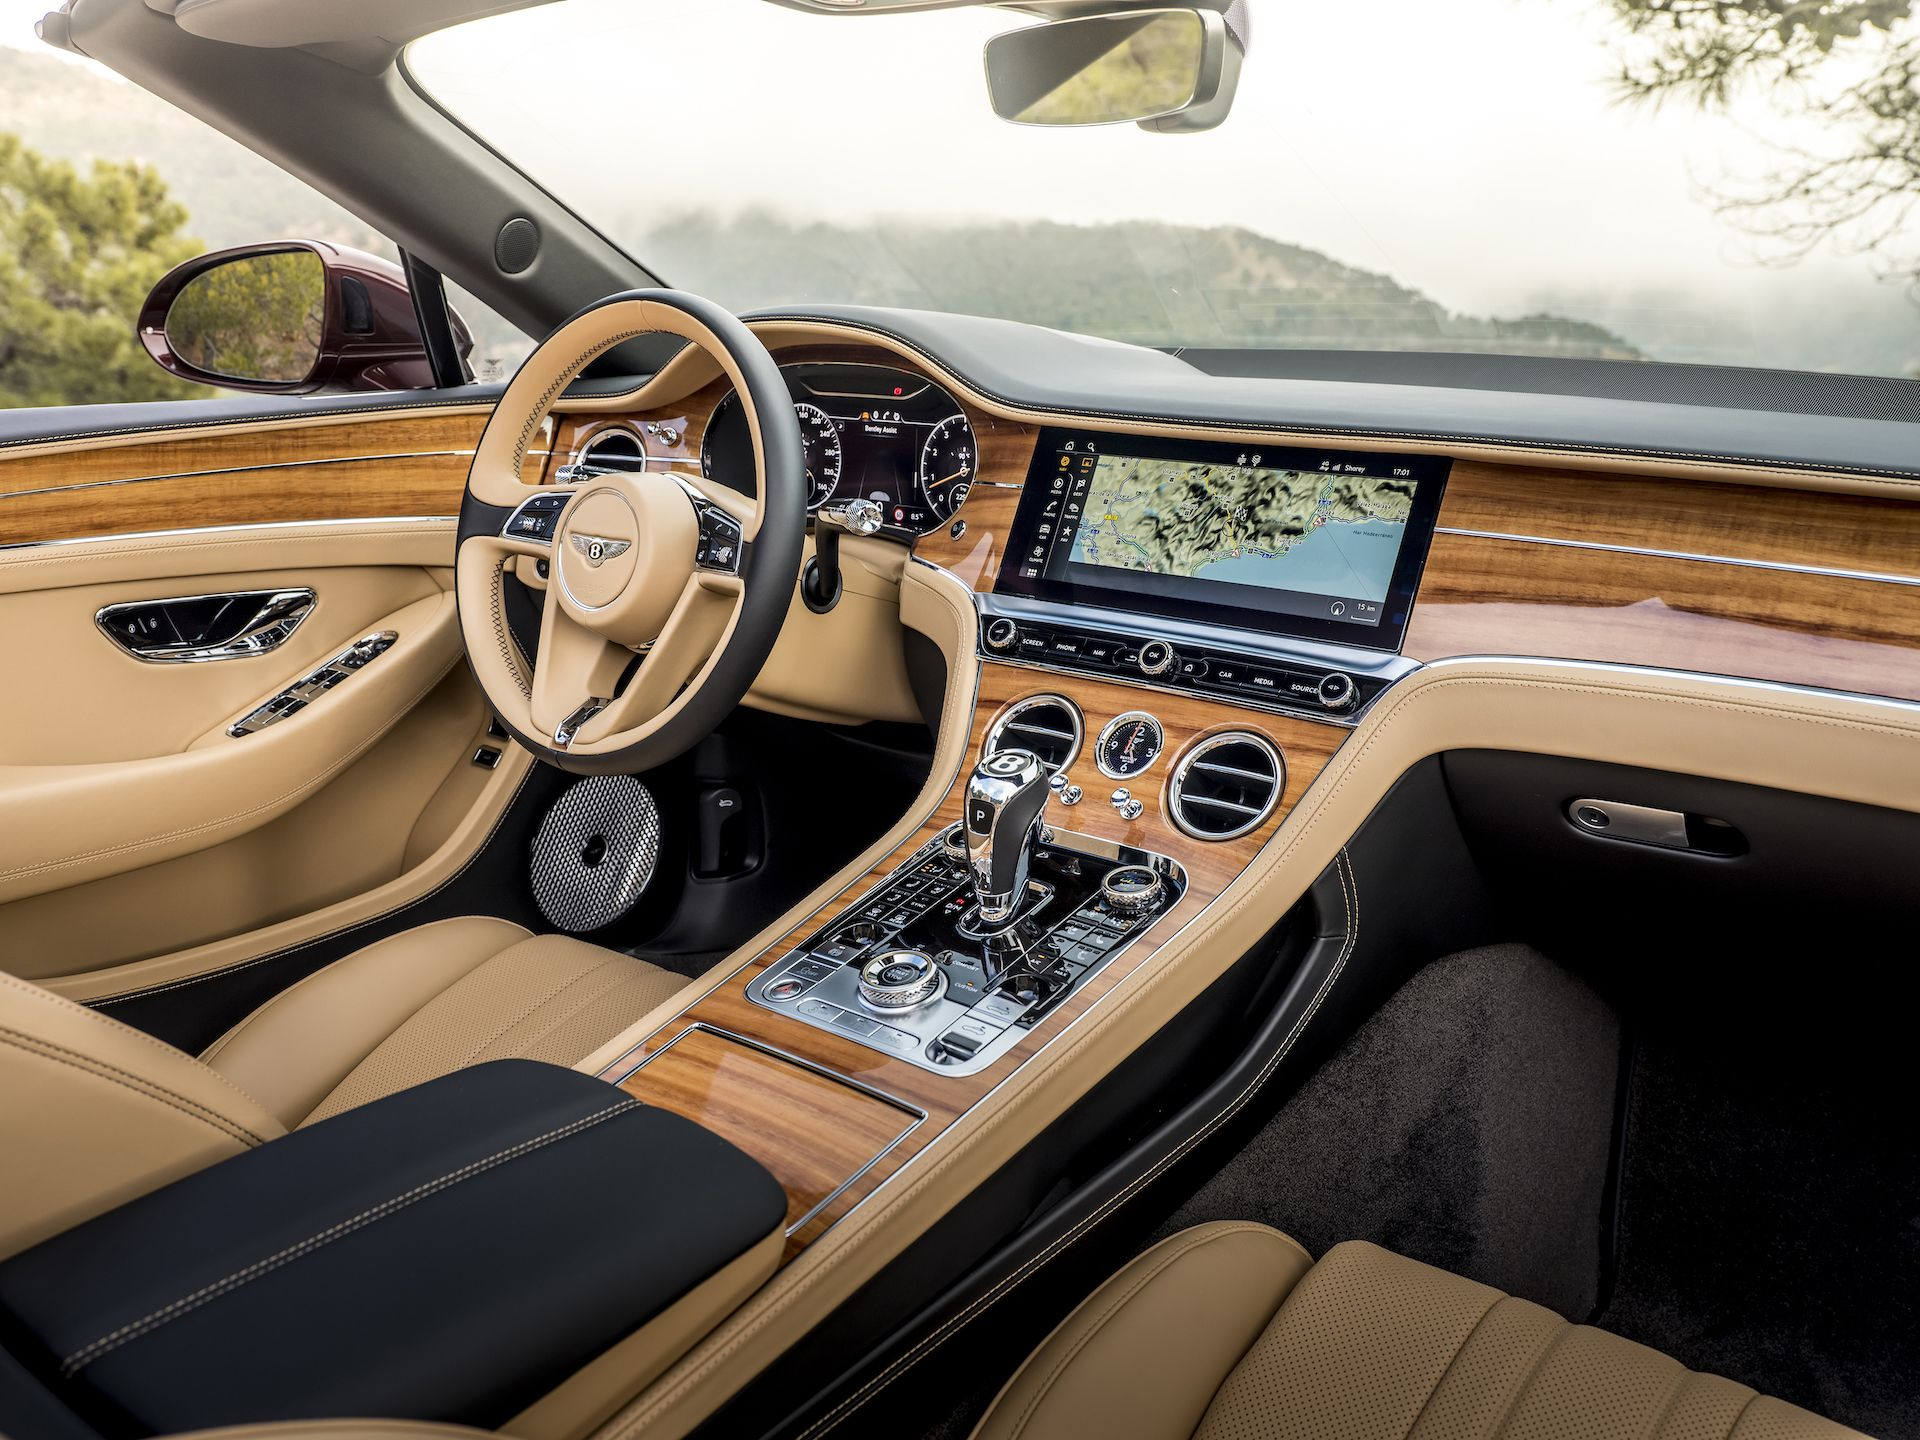 2019 Bentley Continental Gt Convertible Color Verdant Interior